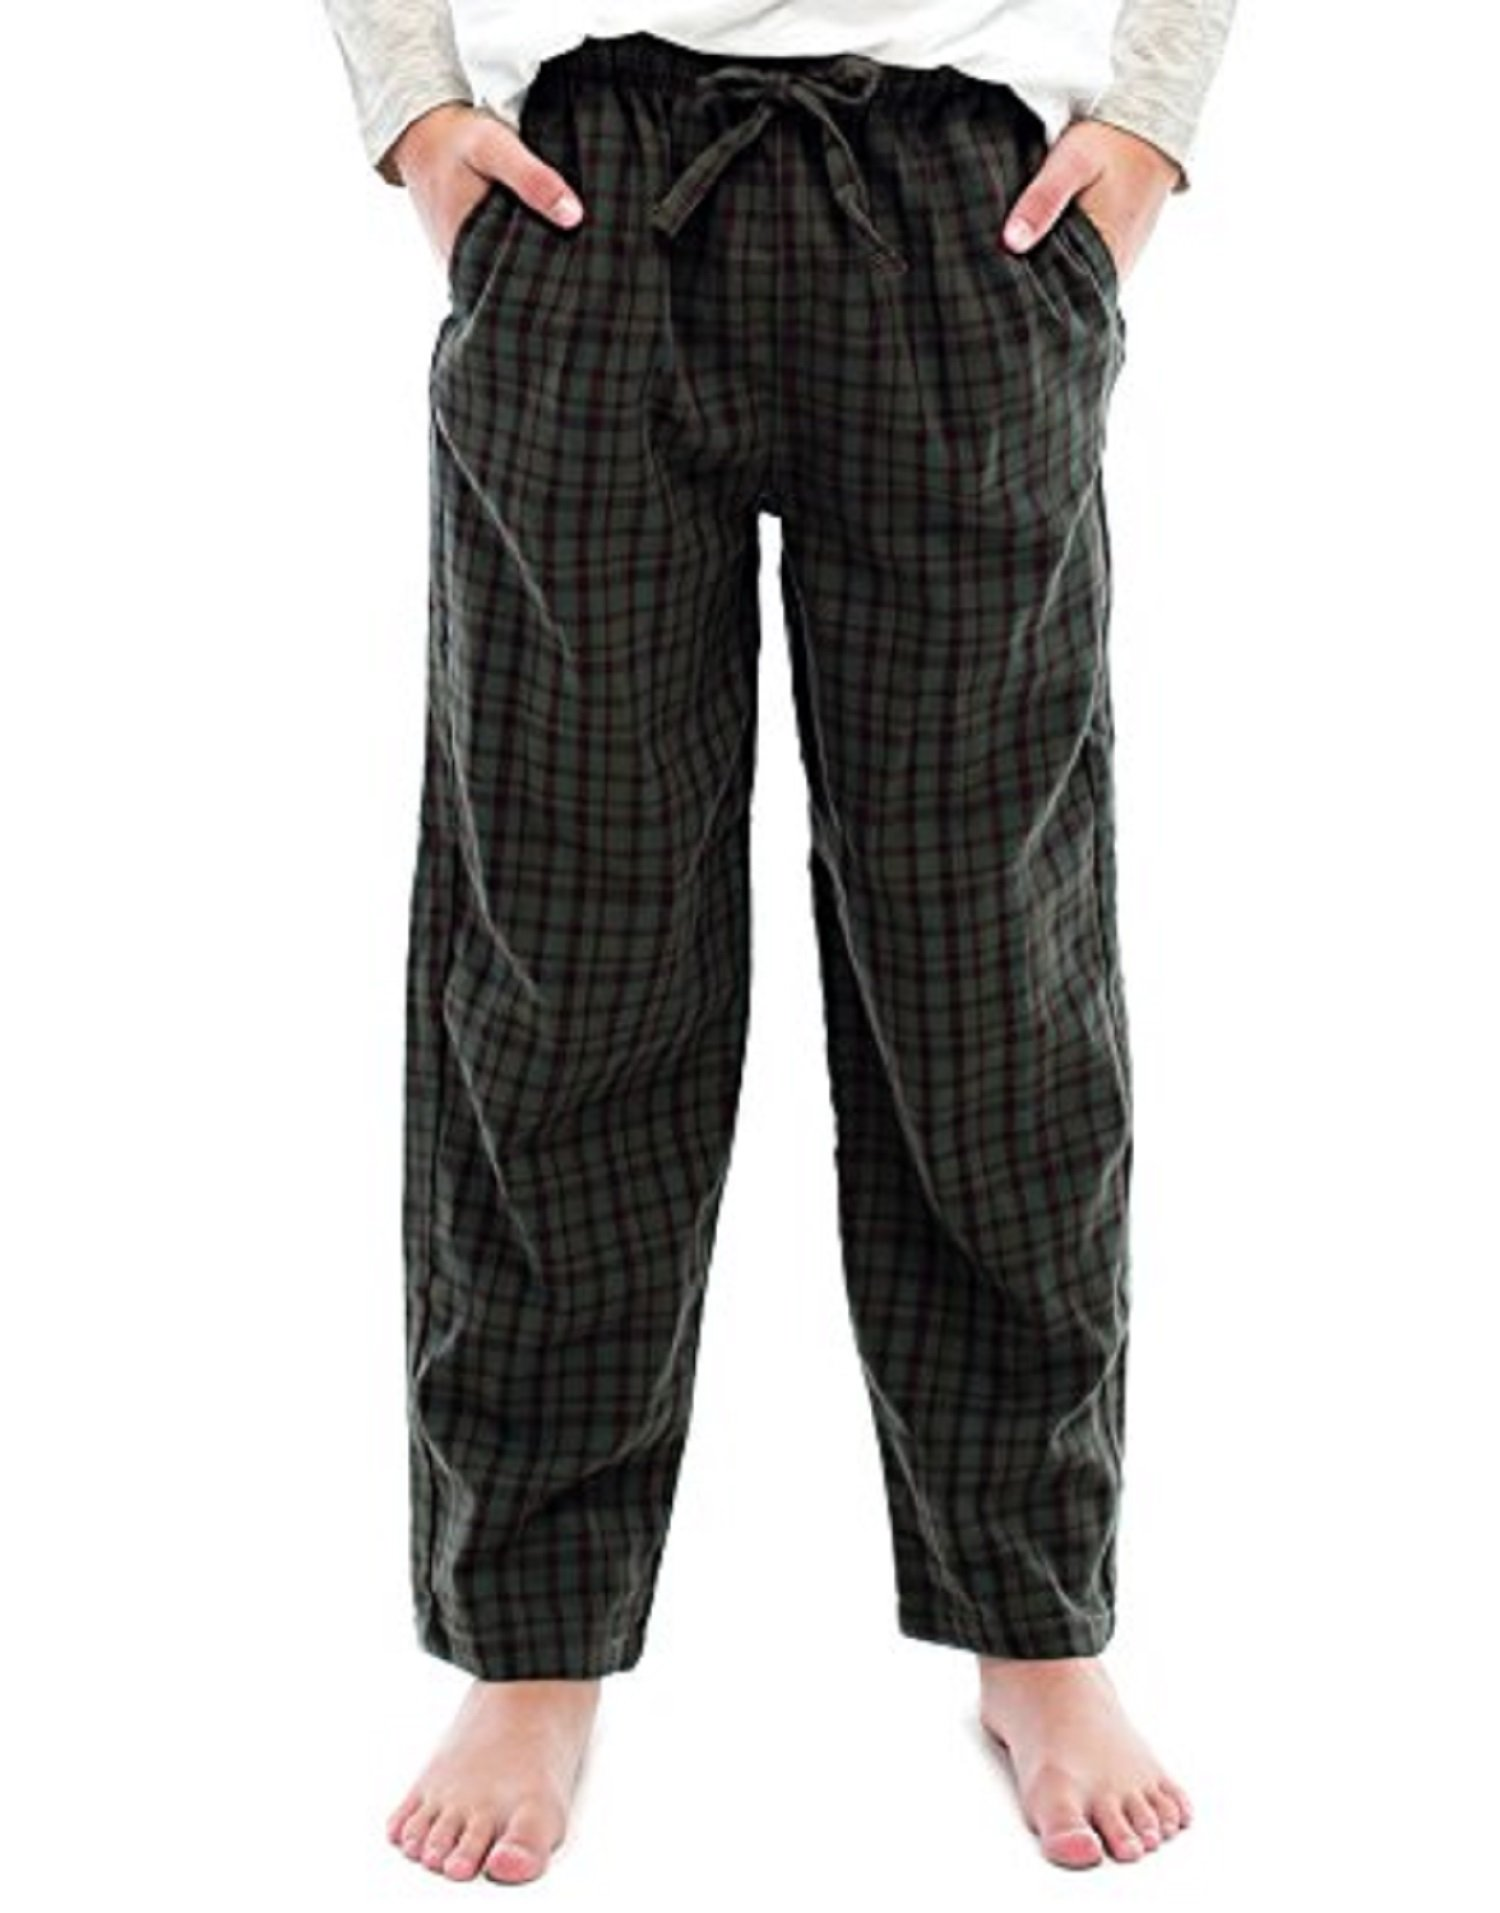 TINFL Boys Plaid Check Soft 100% Cotton Lounge Pants BP-23-Darkgreen-YM